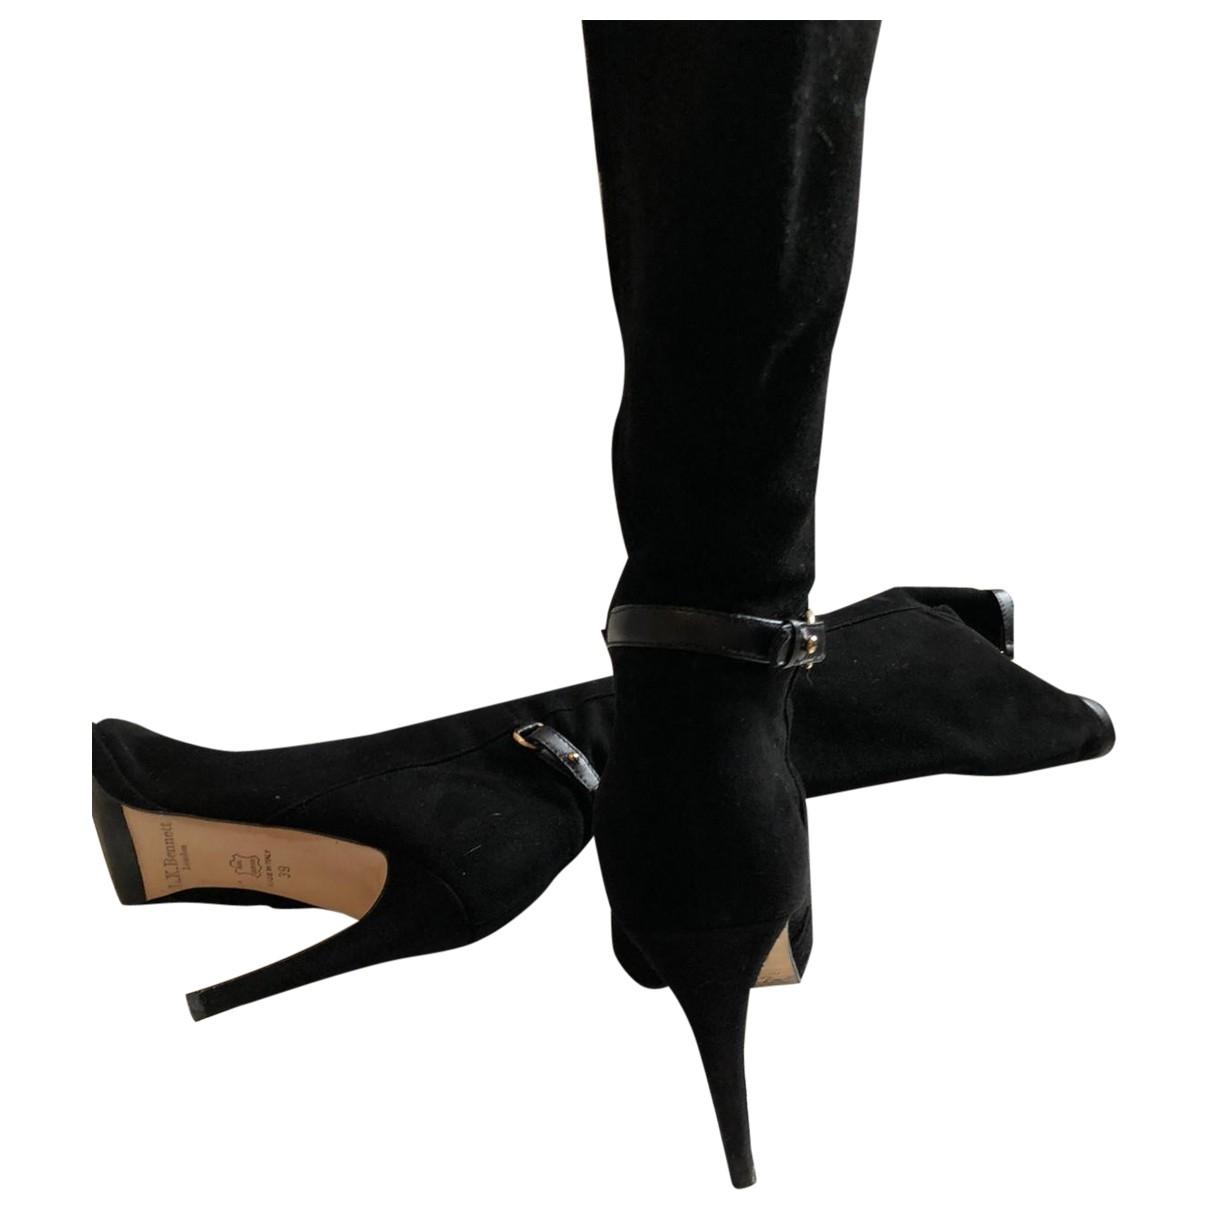 Lk Bennett \N Black Suede Boots for Women 6 UK